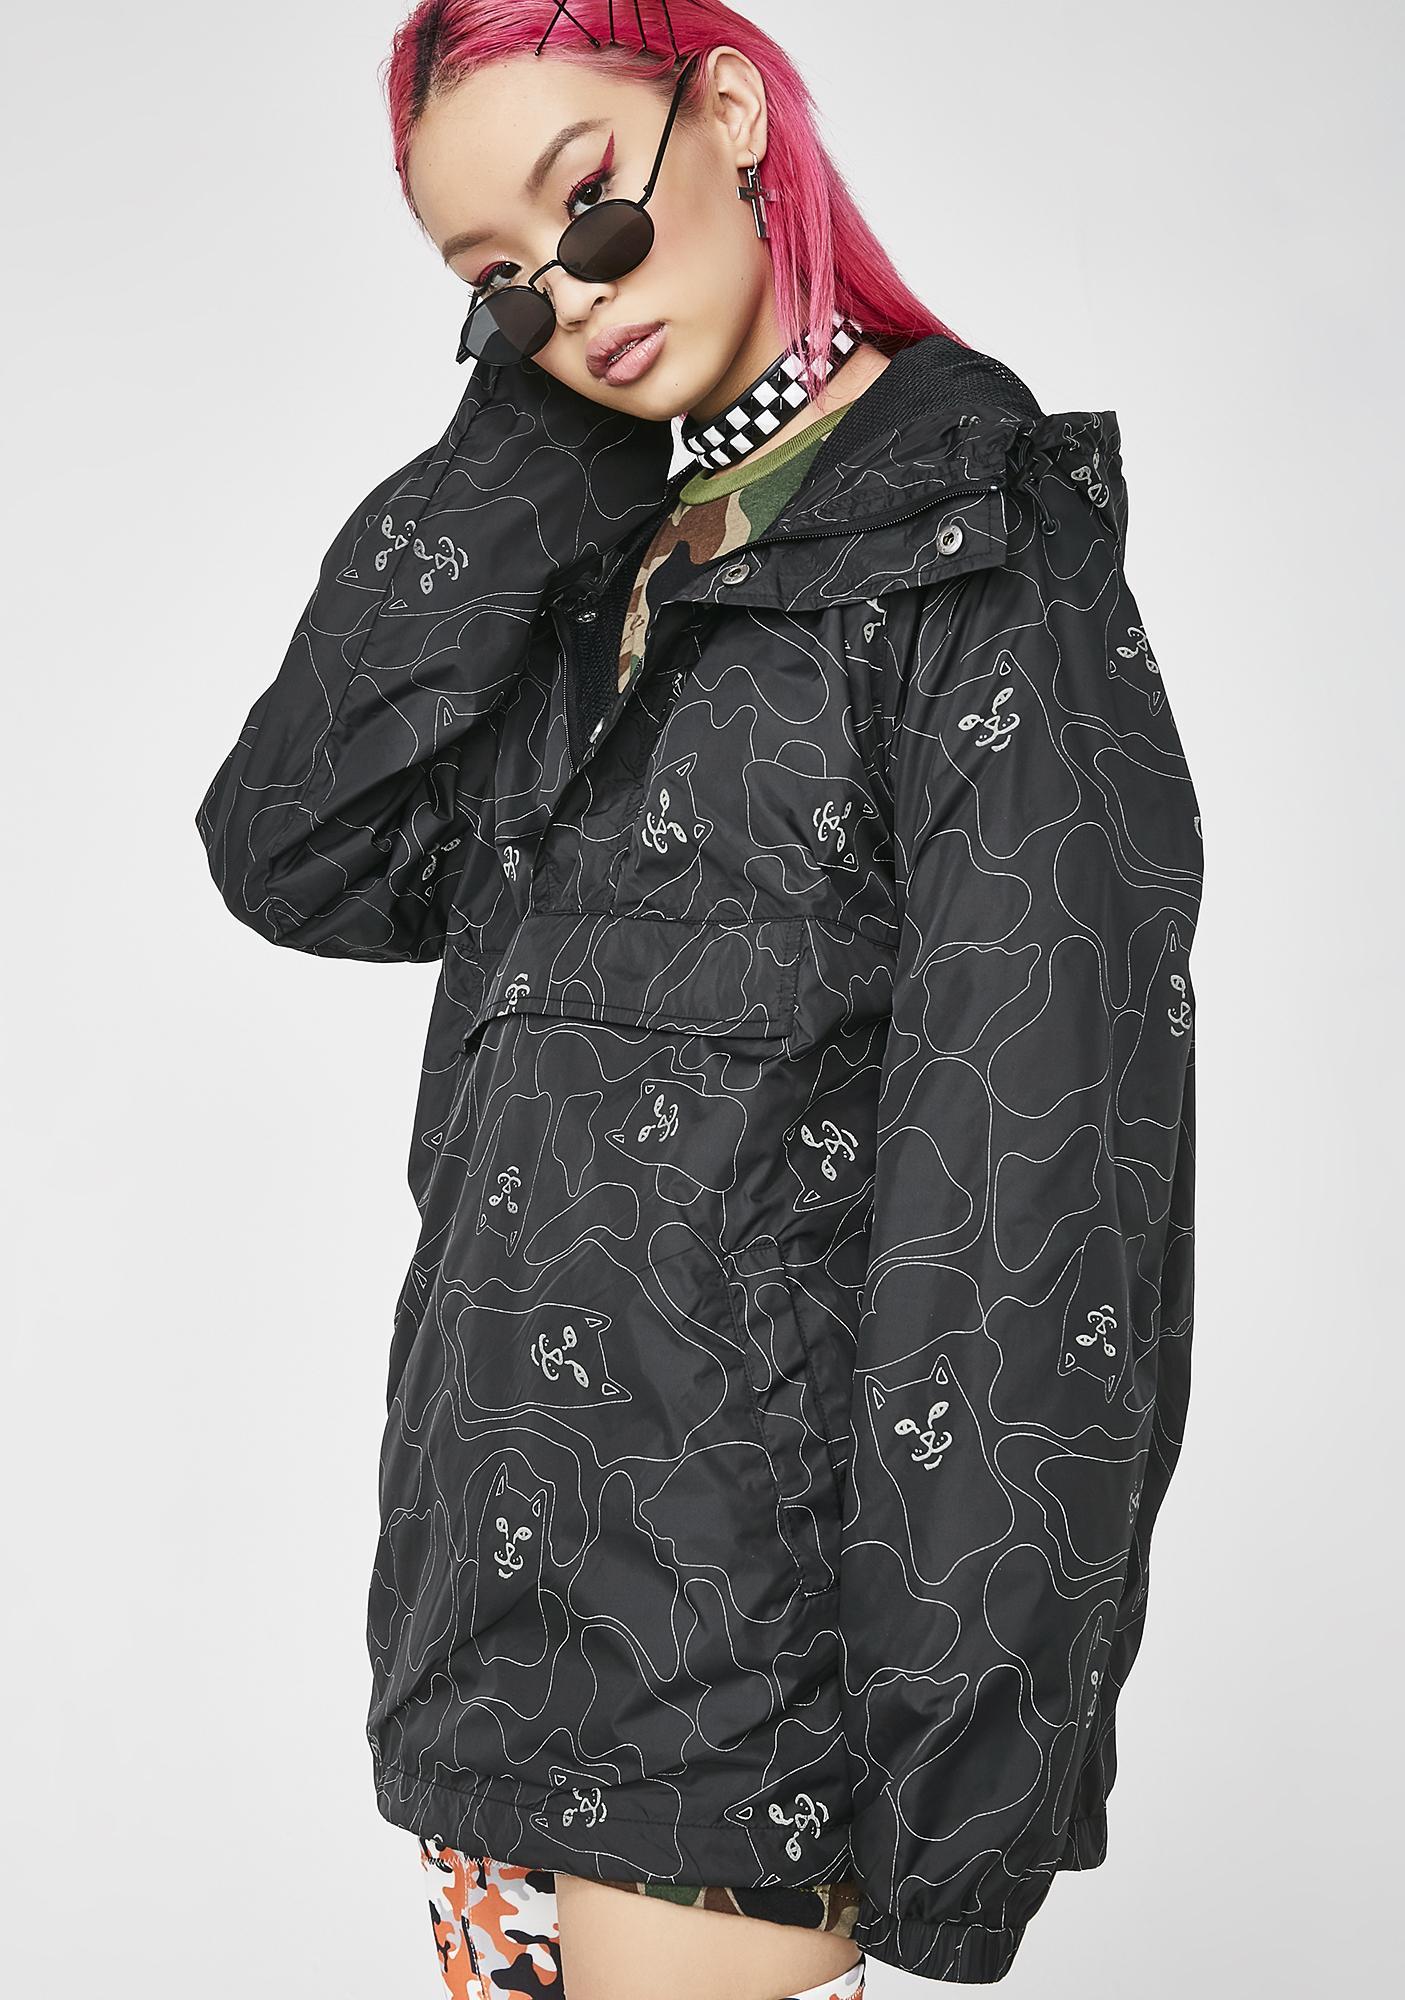 RIPNDIP Nermal 3M Line Camo Jacket